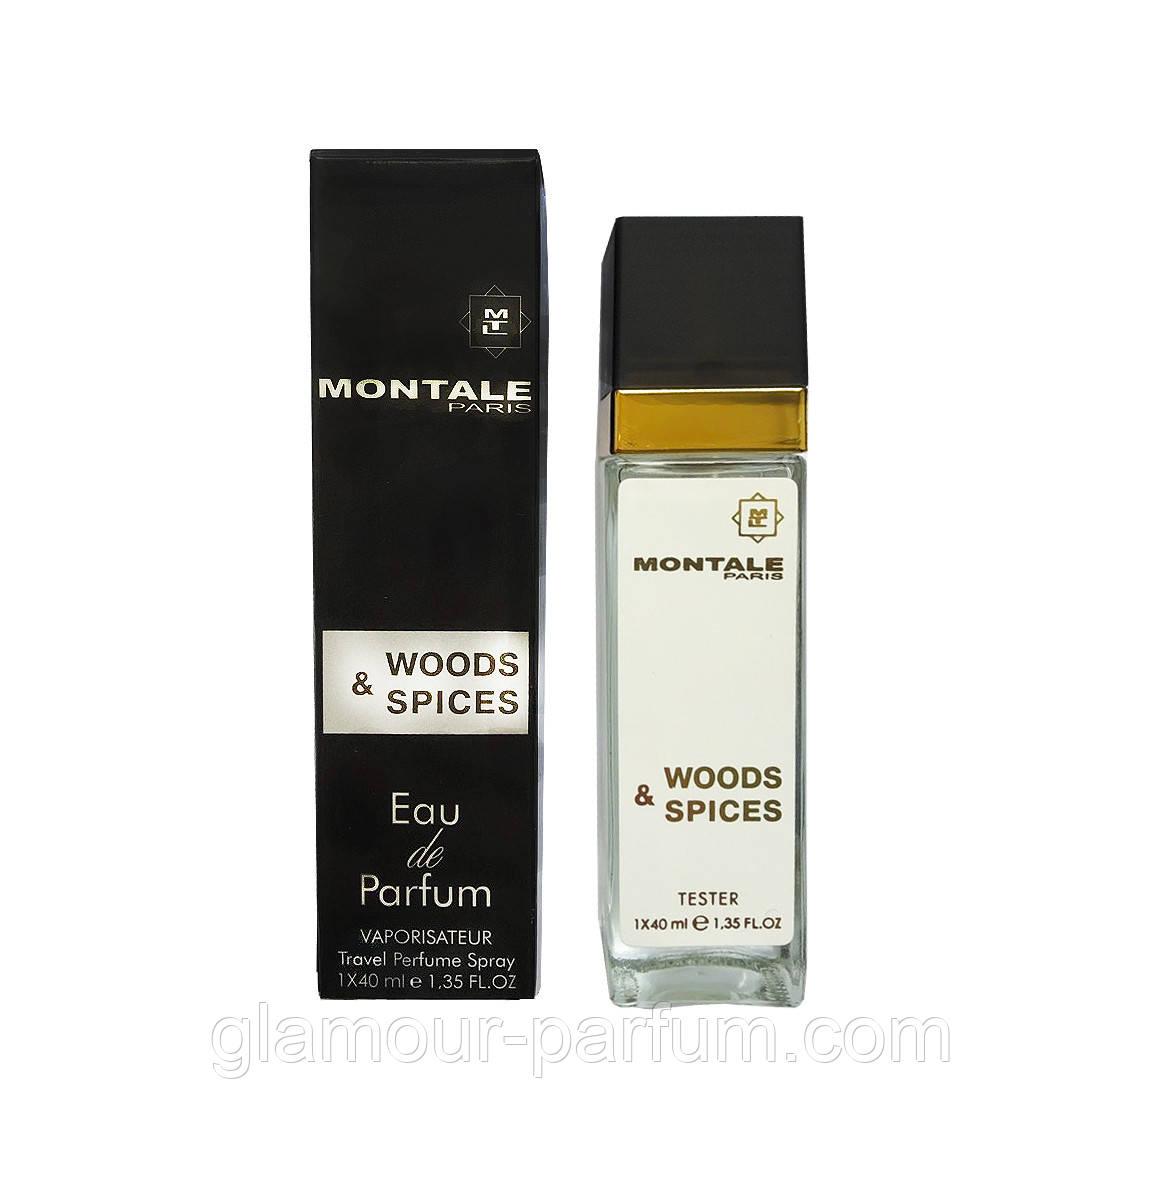 Montale Wood & Spices (Монталь Вуд энд Спайс) 40 мл (реплика) ОПТ